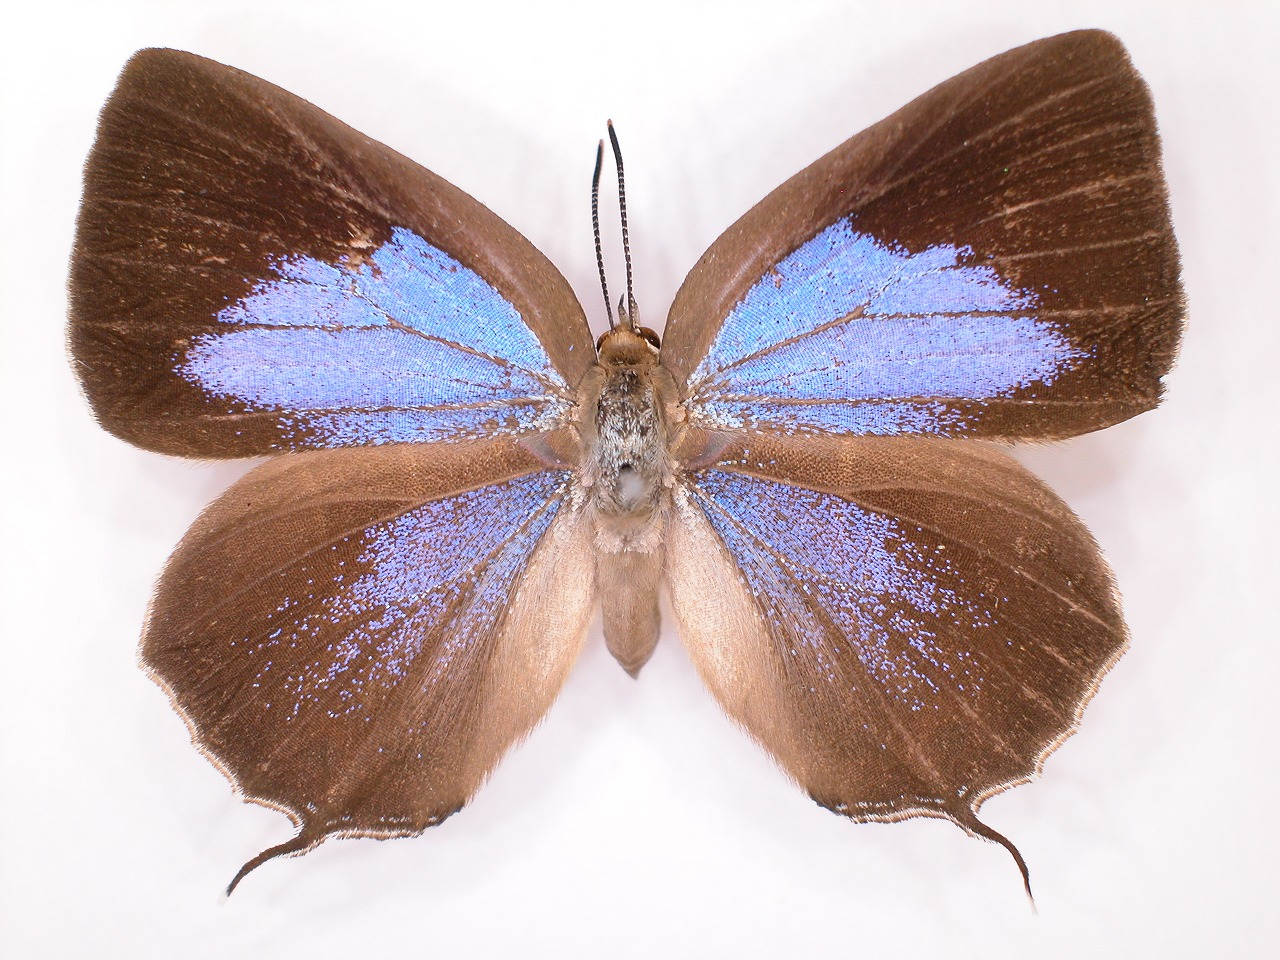 https://www.hitohaku.jp/material/l-material/butterfly-wing/5-lycaenidae/B1-638195_A.jpg